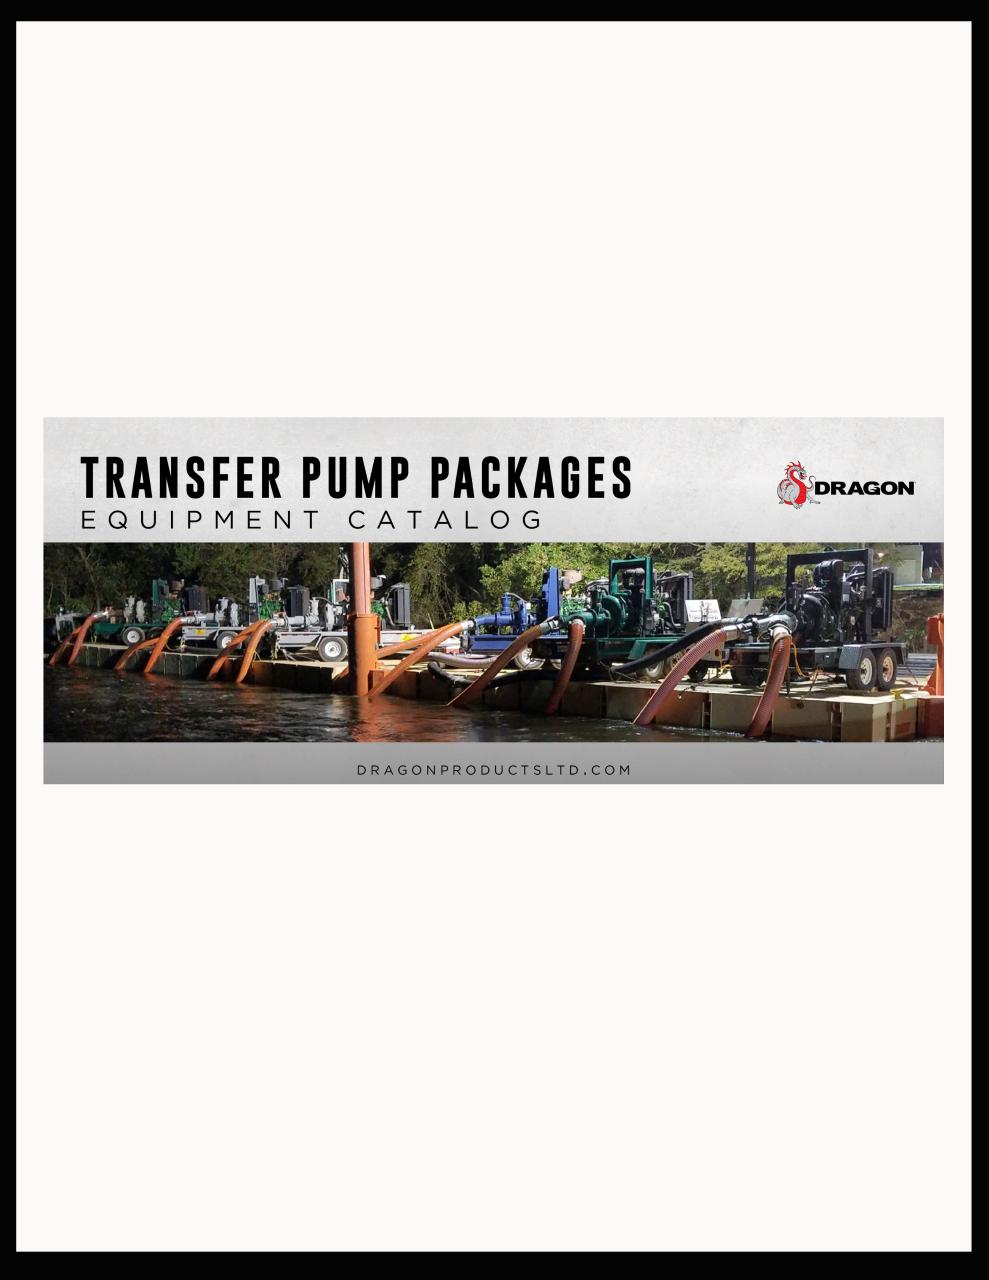 Transfer Pumps Packages Equipment Catalog - Mini Flip Book